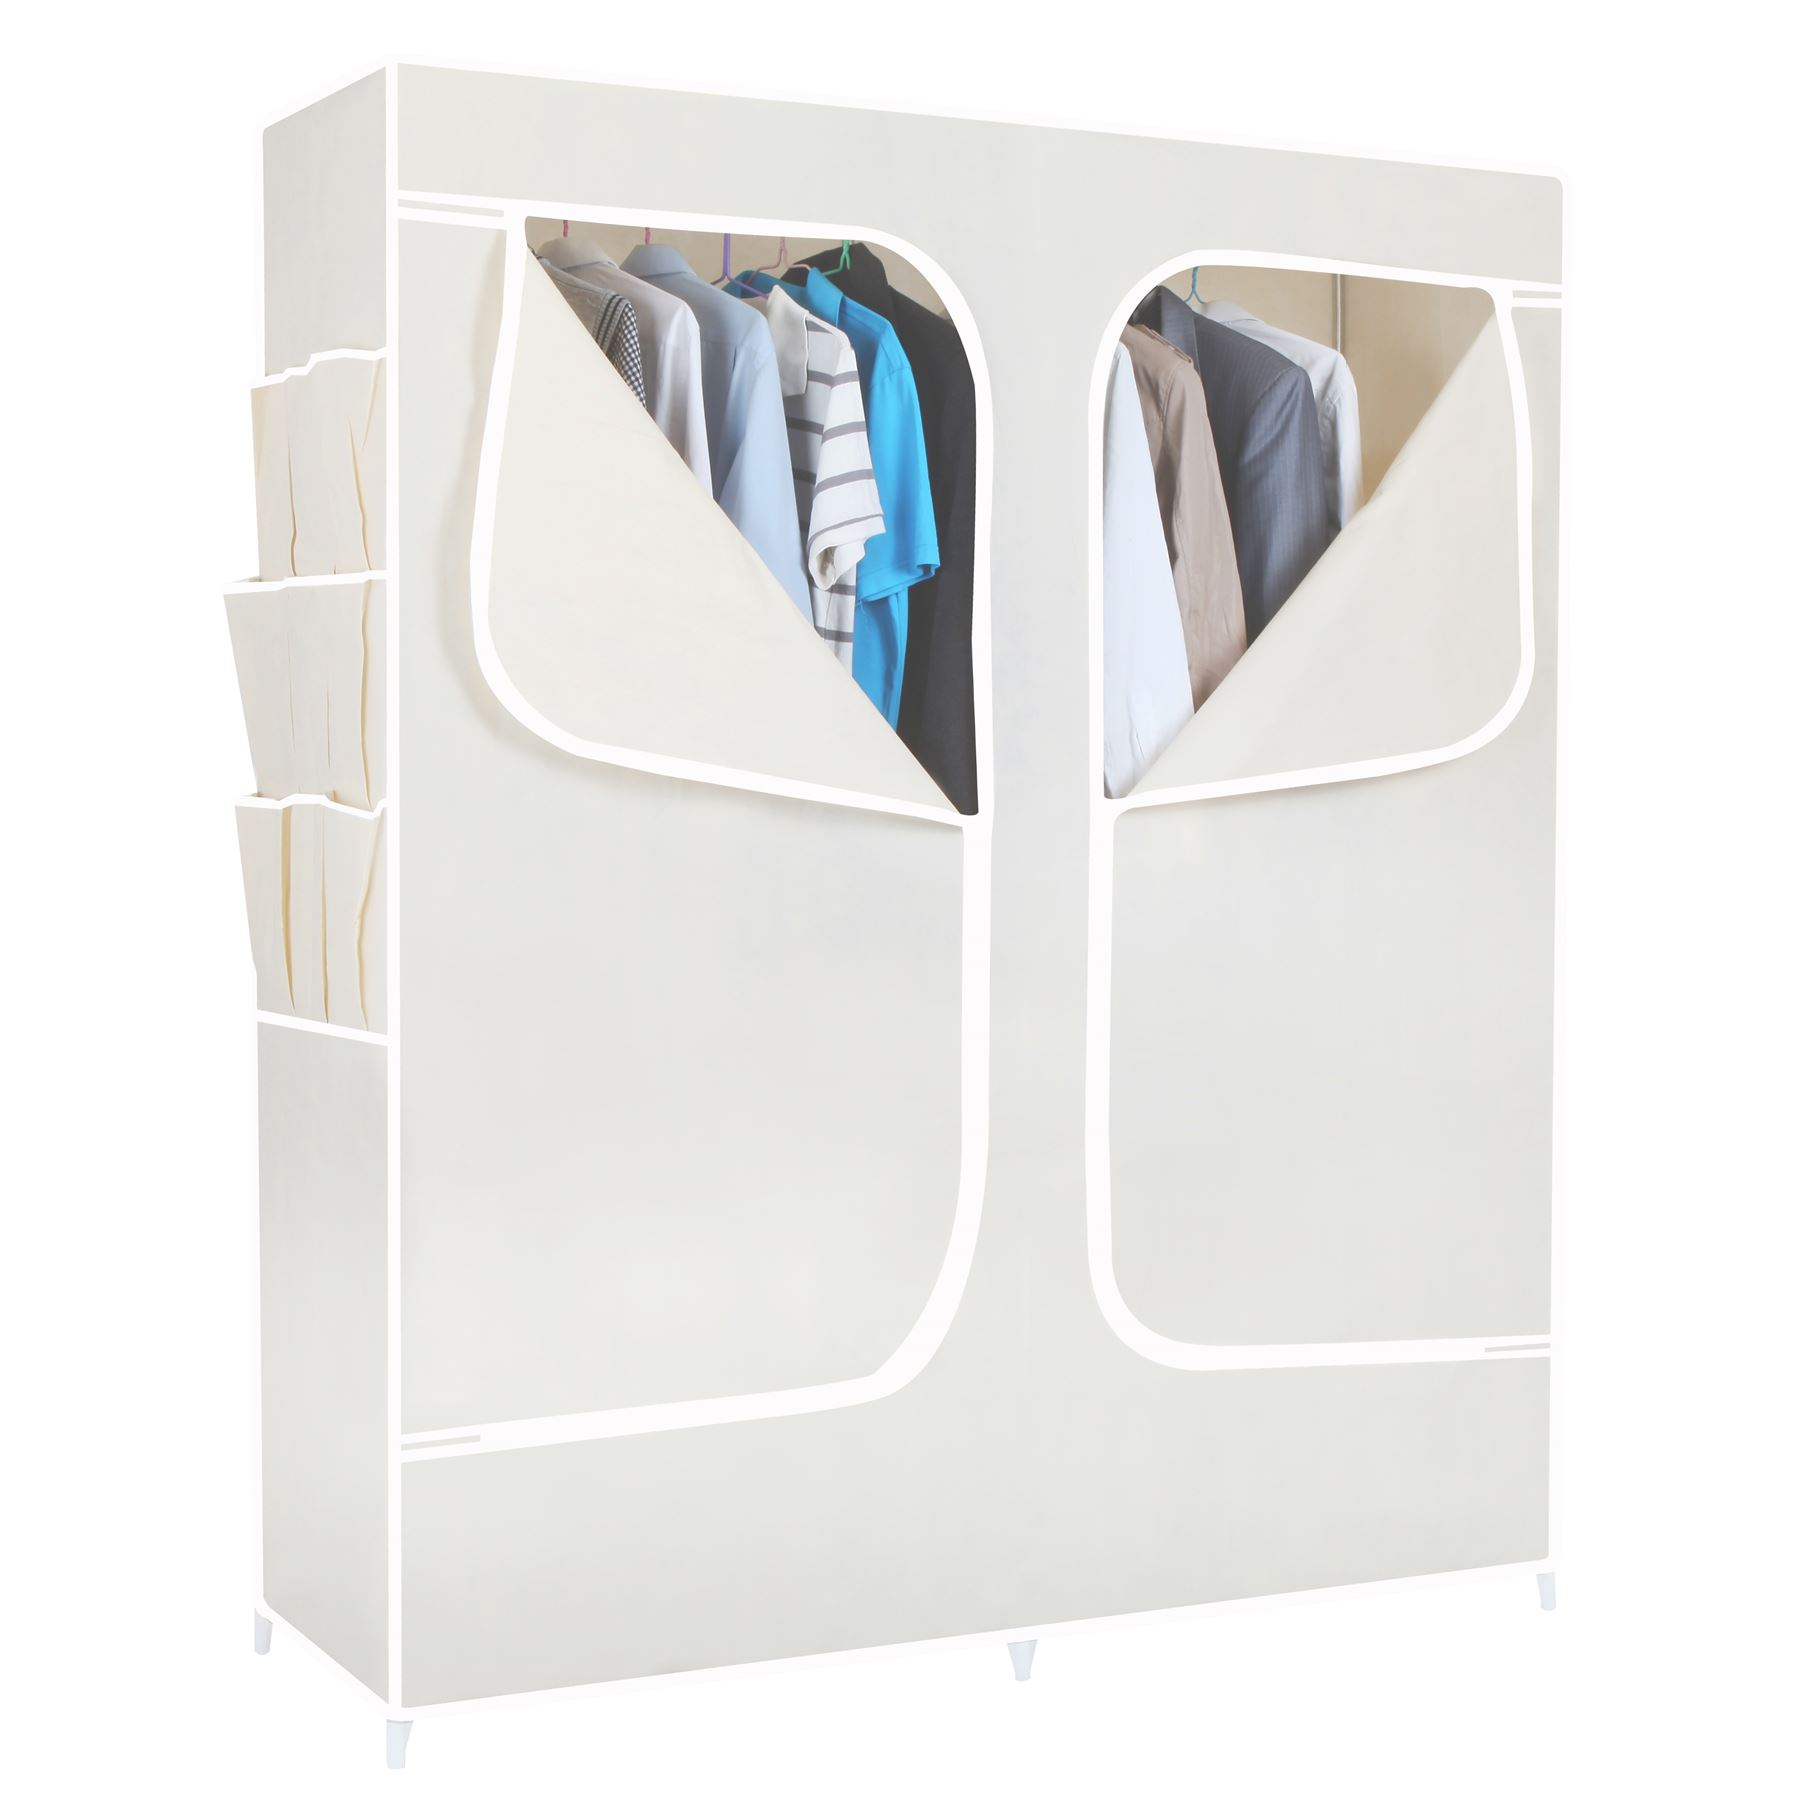 canvas fabric wardrobe door storage closet with